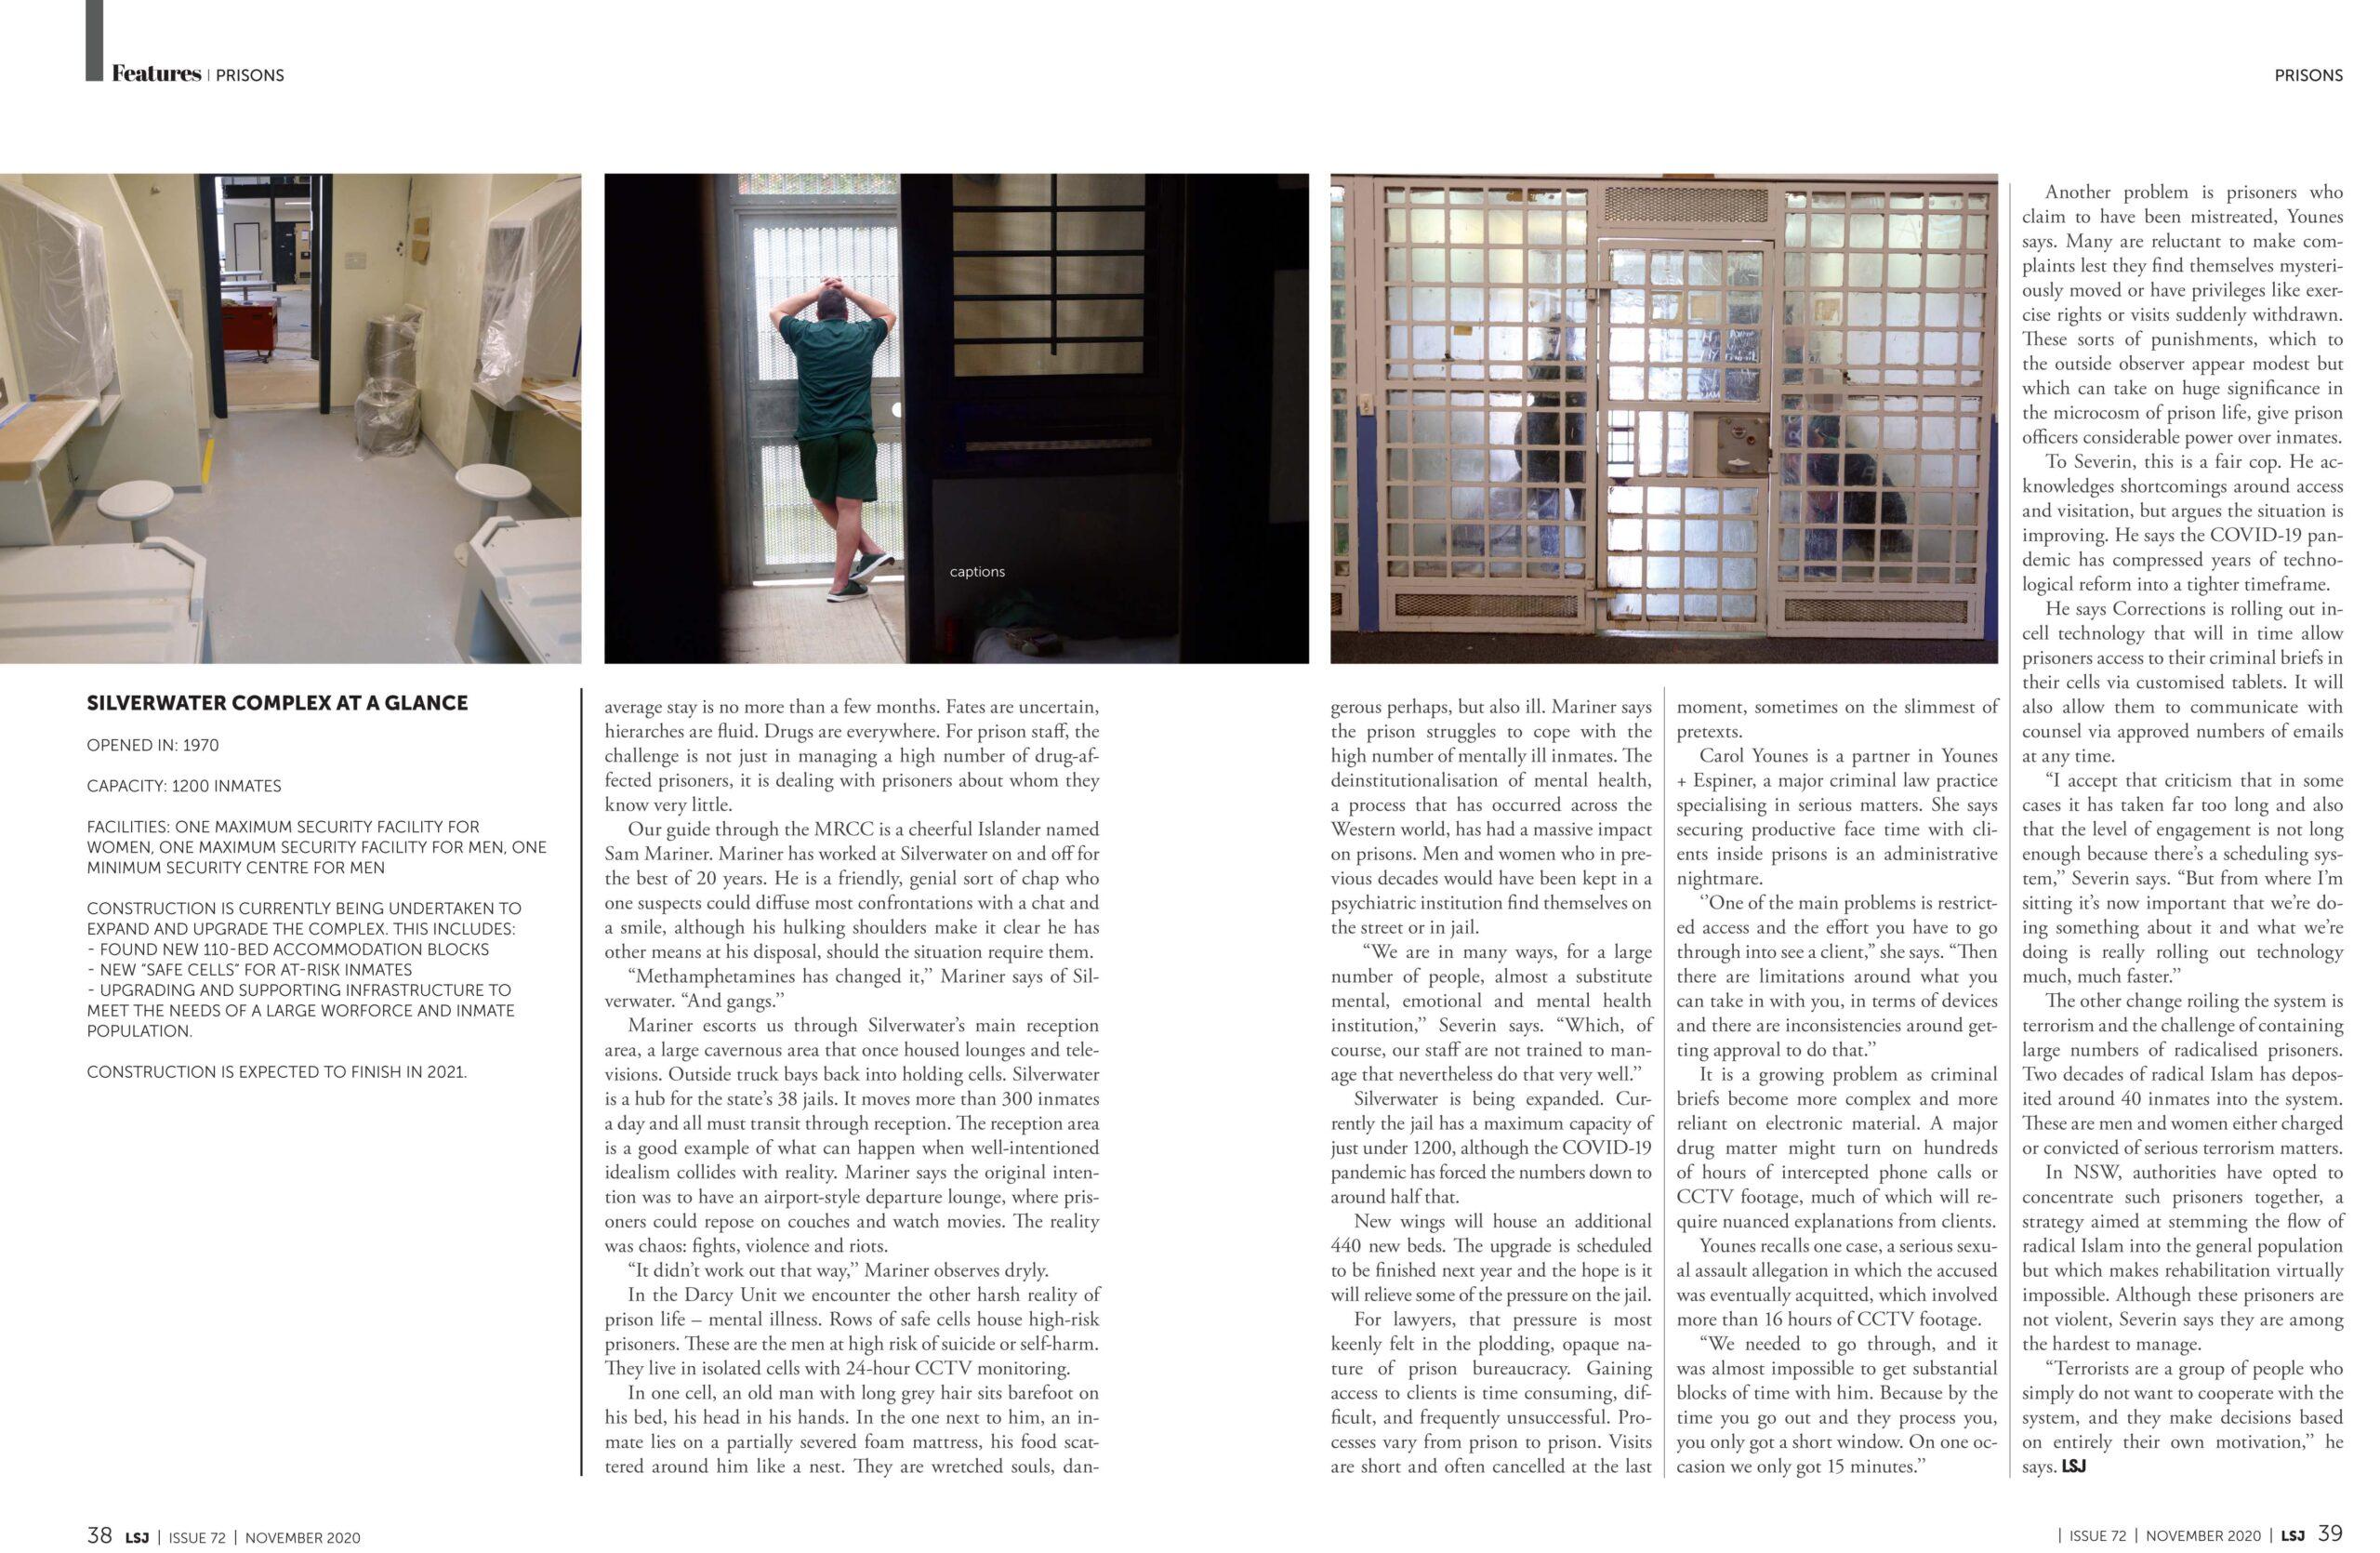 Silverwater Prison Editorial